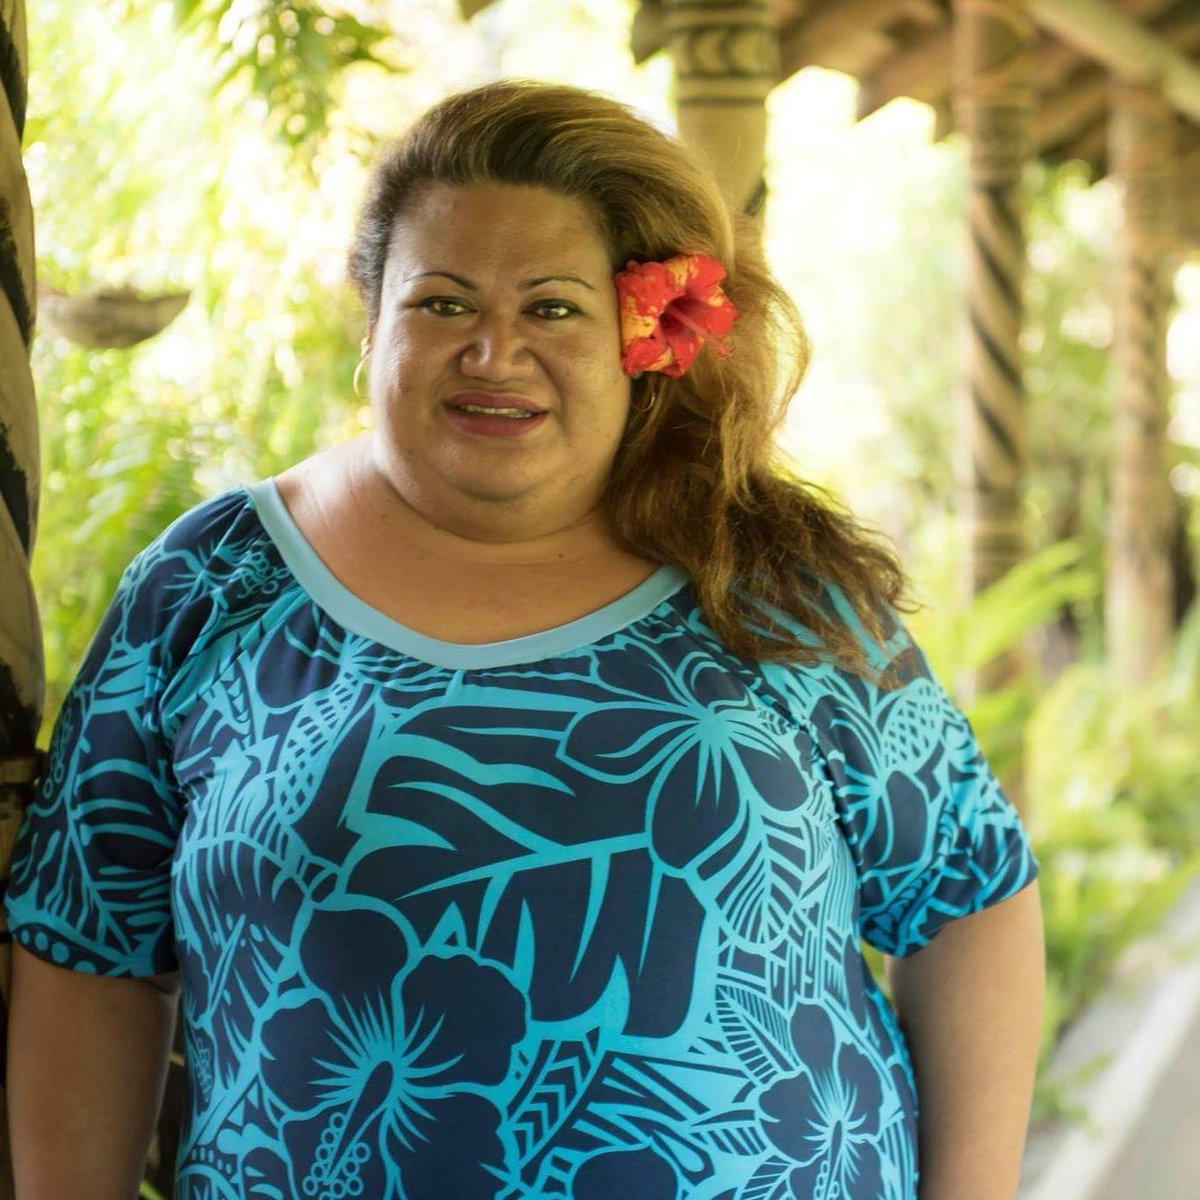 samoa single women Meet women in samoa chat & make friends with women in samoa at the fastest growing social networking website - badoo.